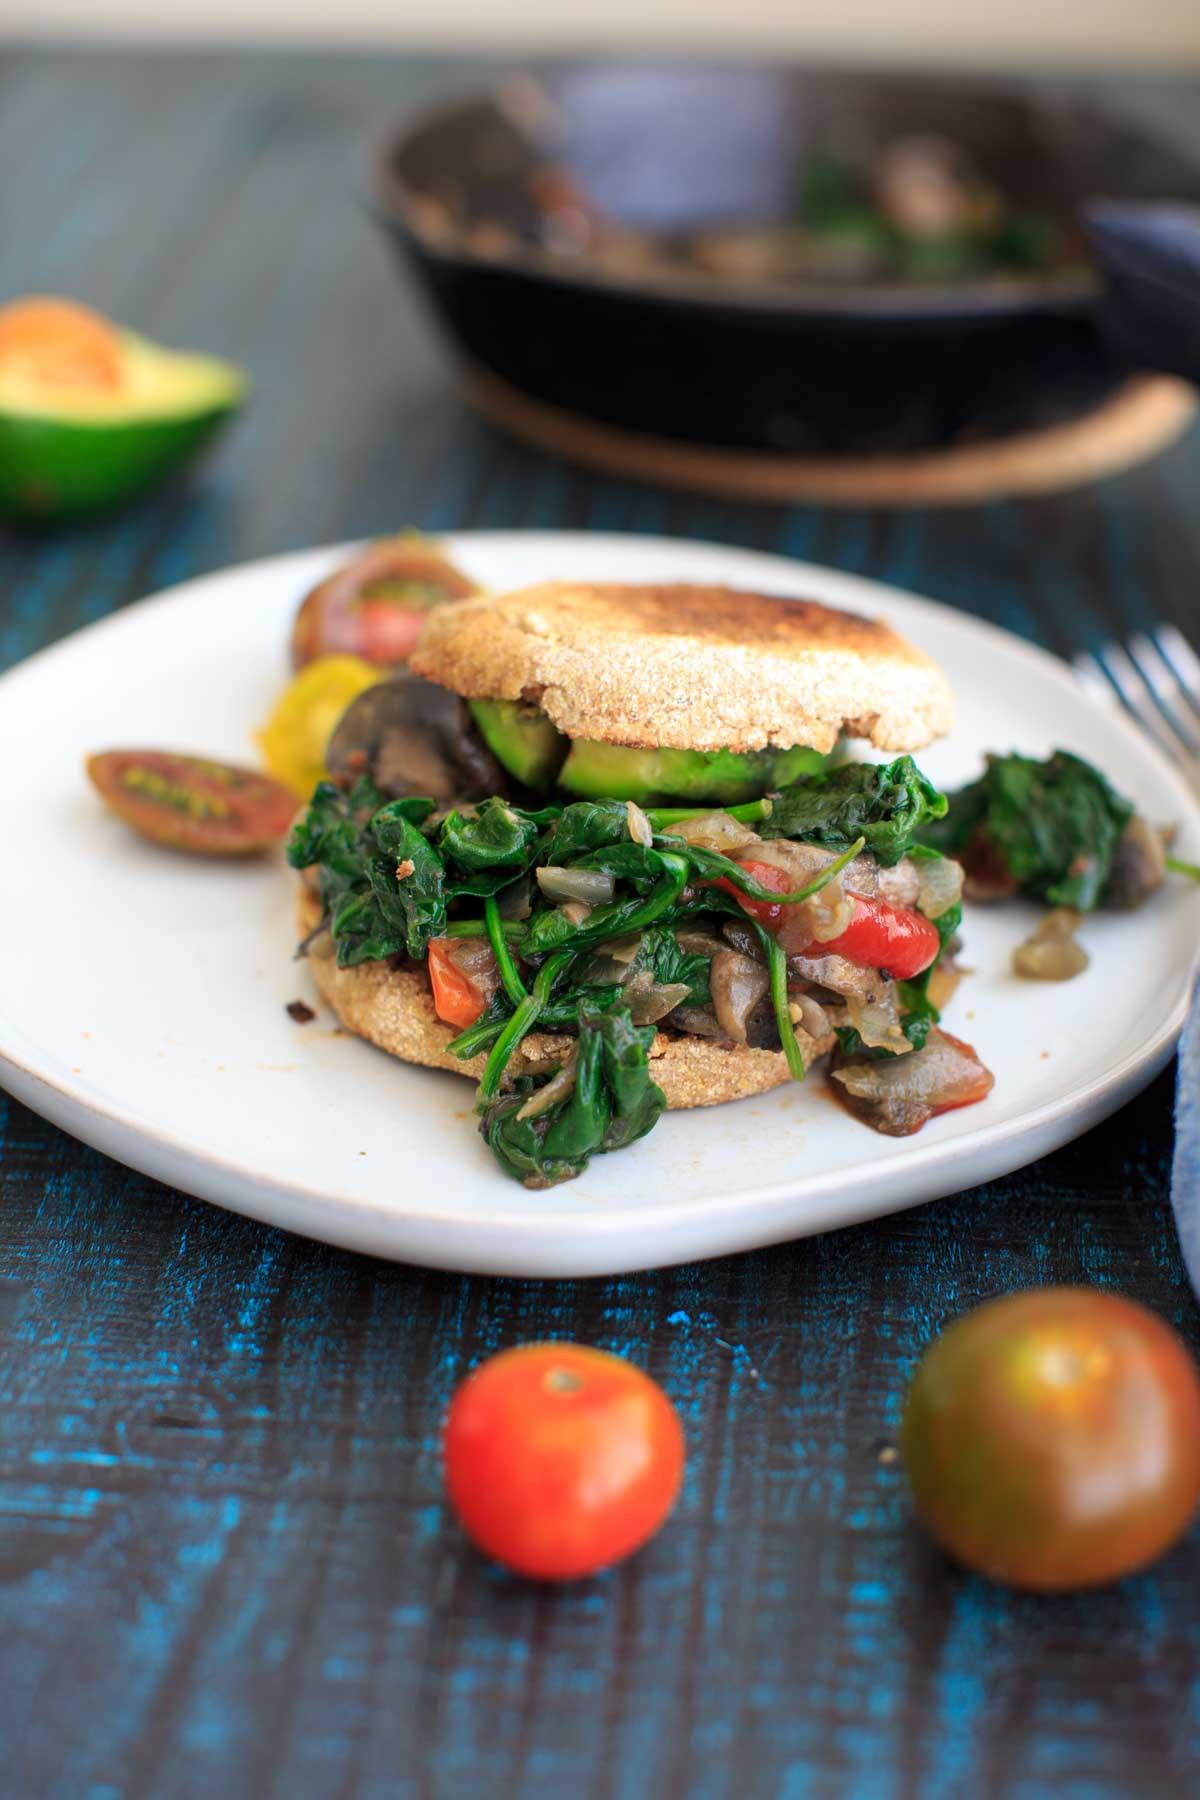 Healthy Vegetarian Breakfast  Healthy Vegan Breakfast Ideas Fit Foo Finds